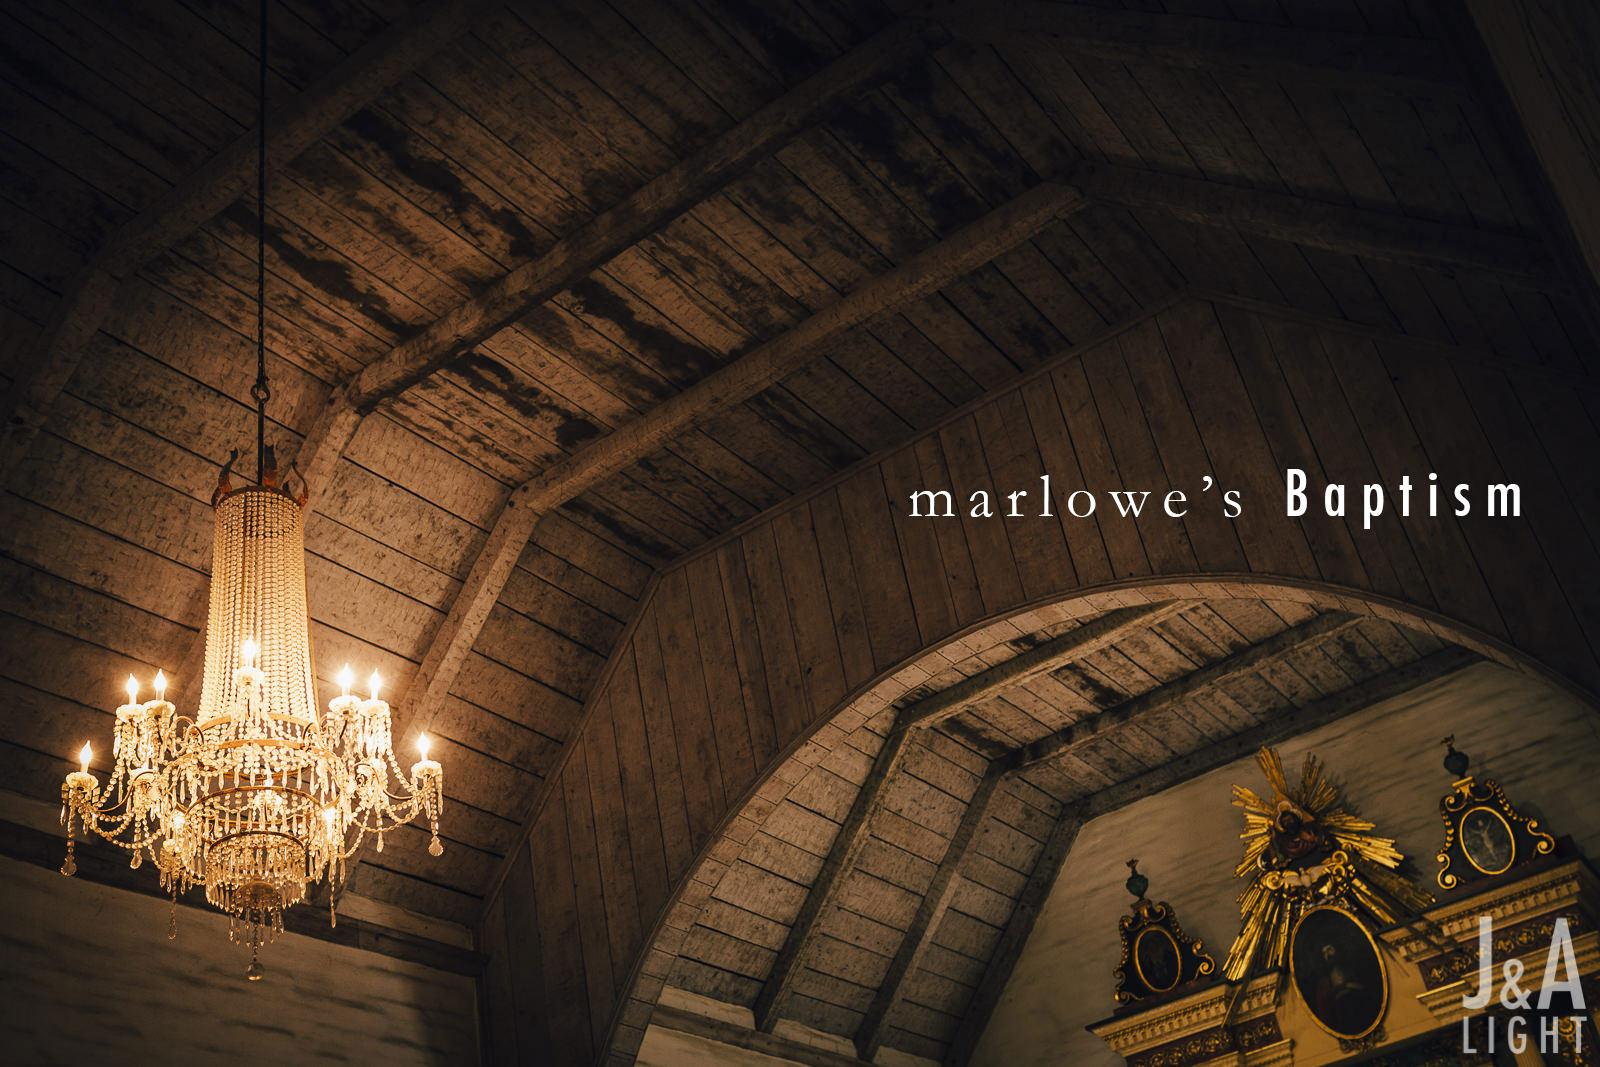 150517-MarloweBaptism-002-webres.jpg